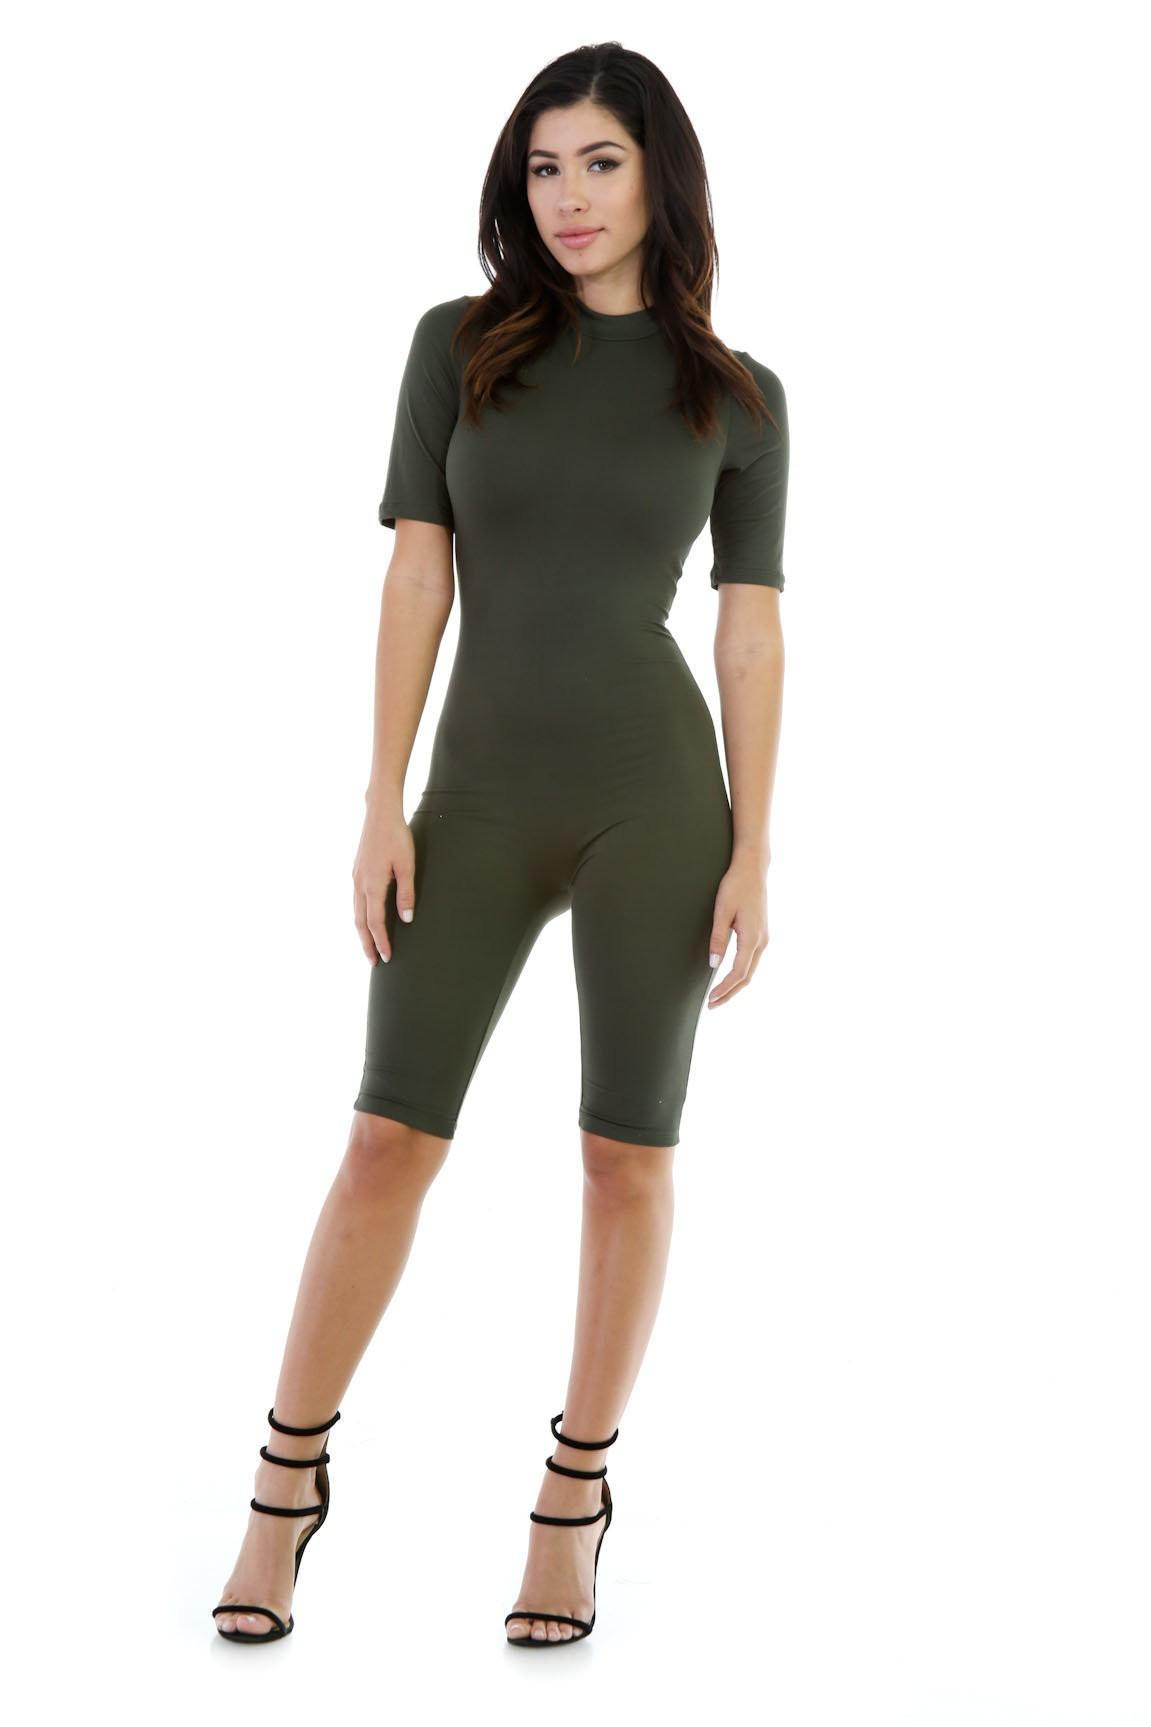 Capri Stretchy Jumpsuit